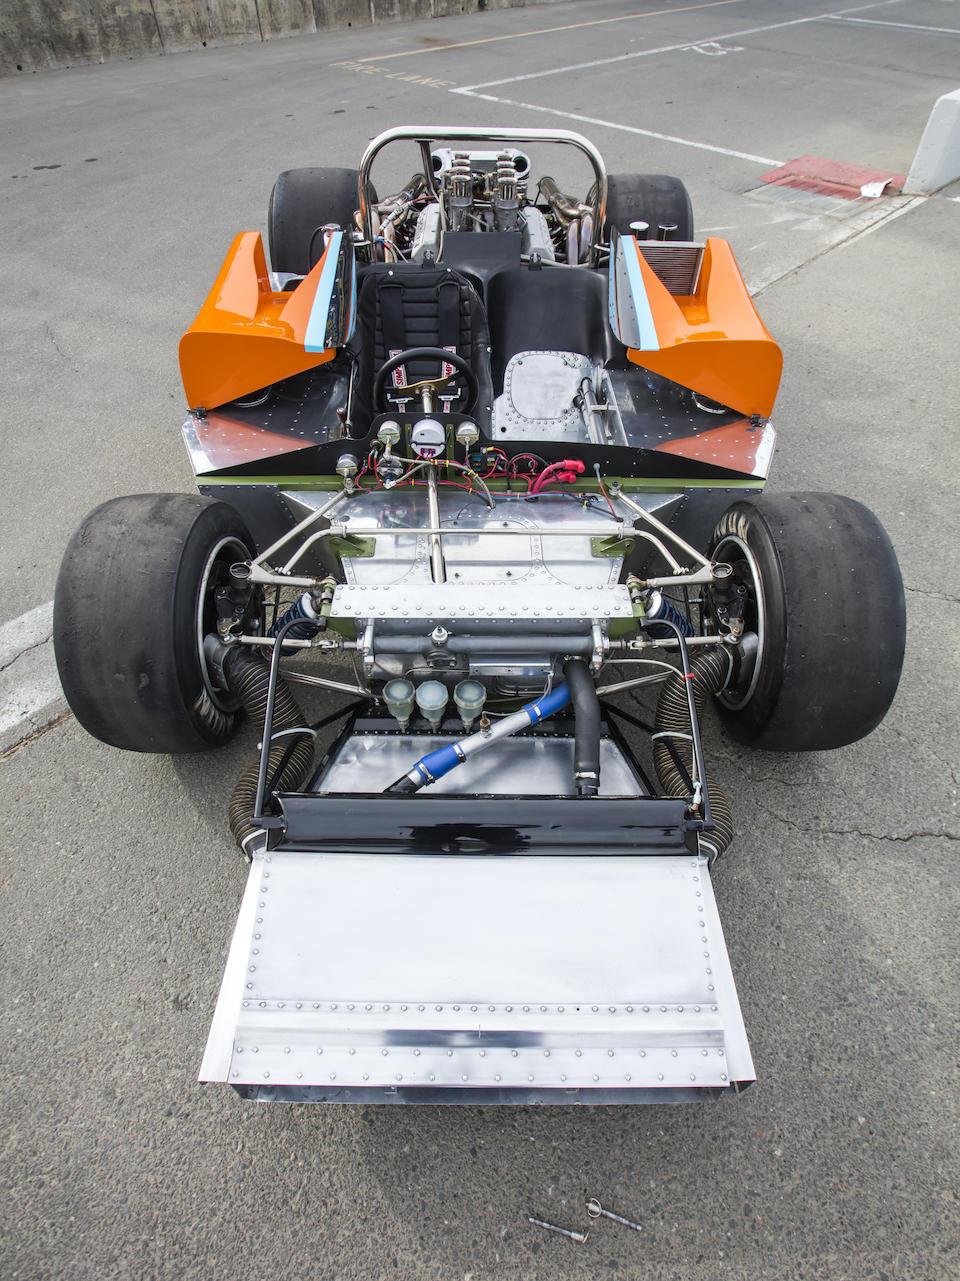 <b>1970 McLaren M8C</b><br />Chassis no. 70-08